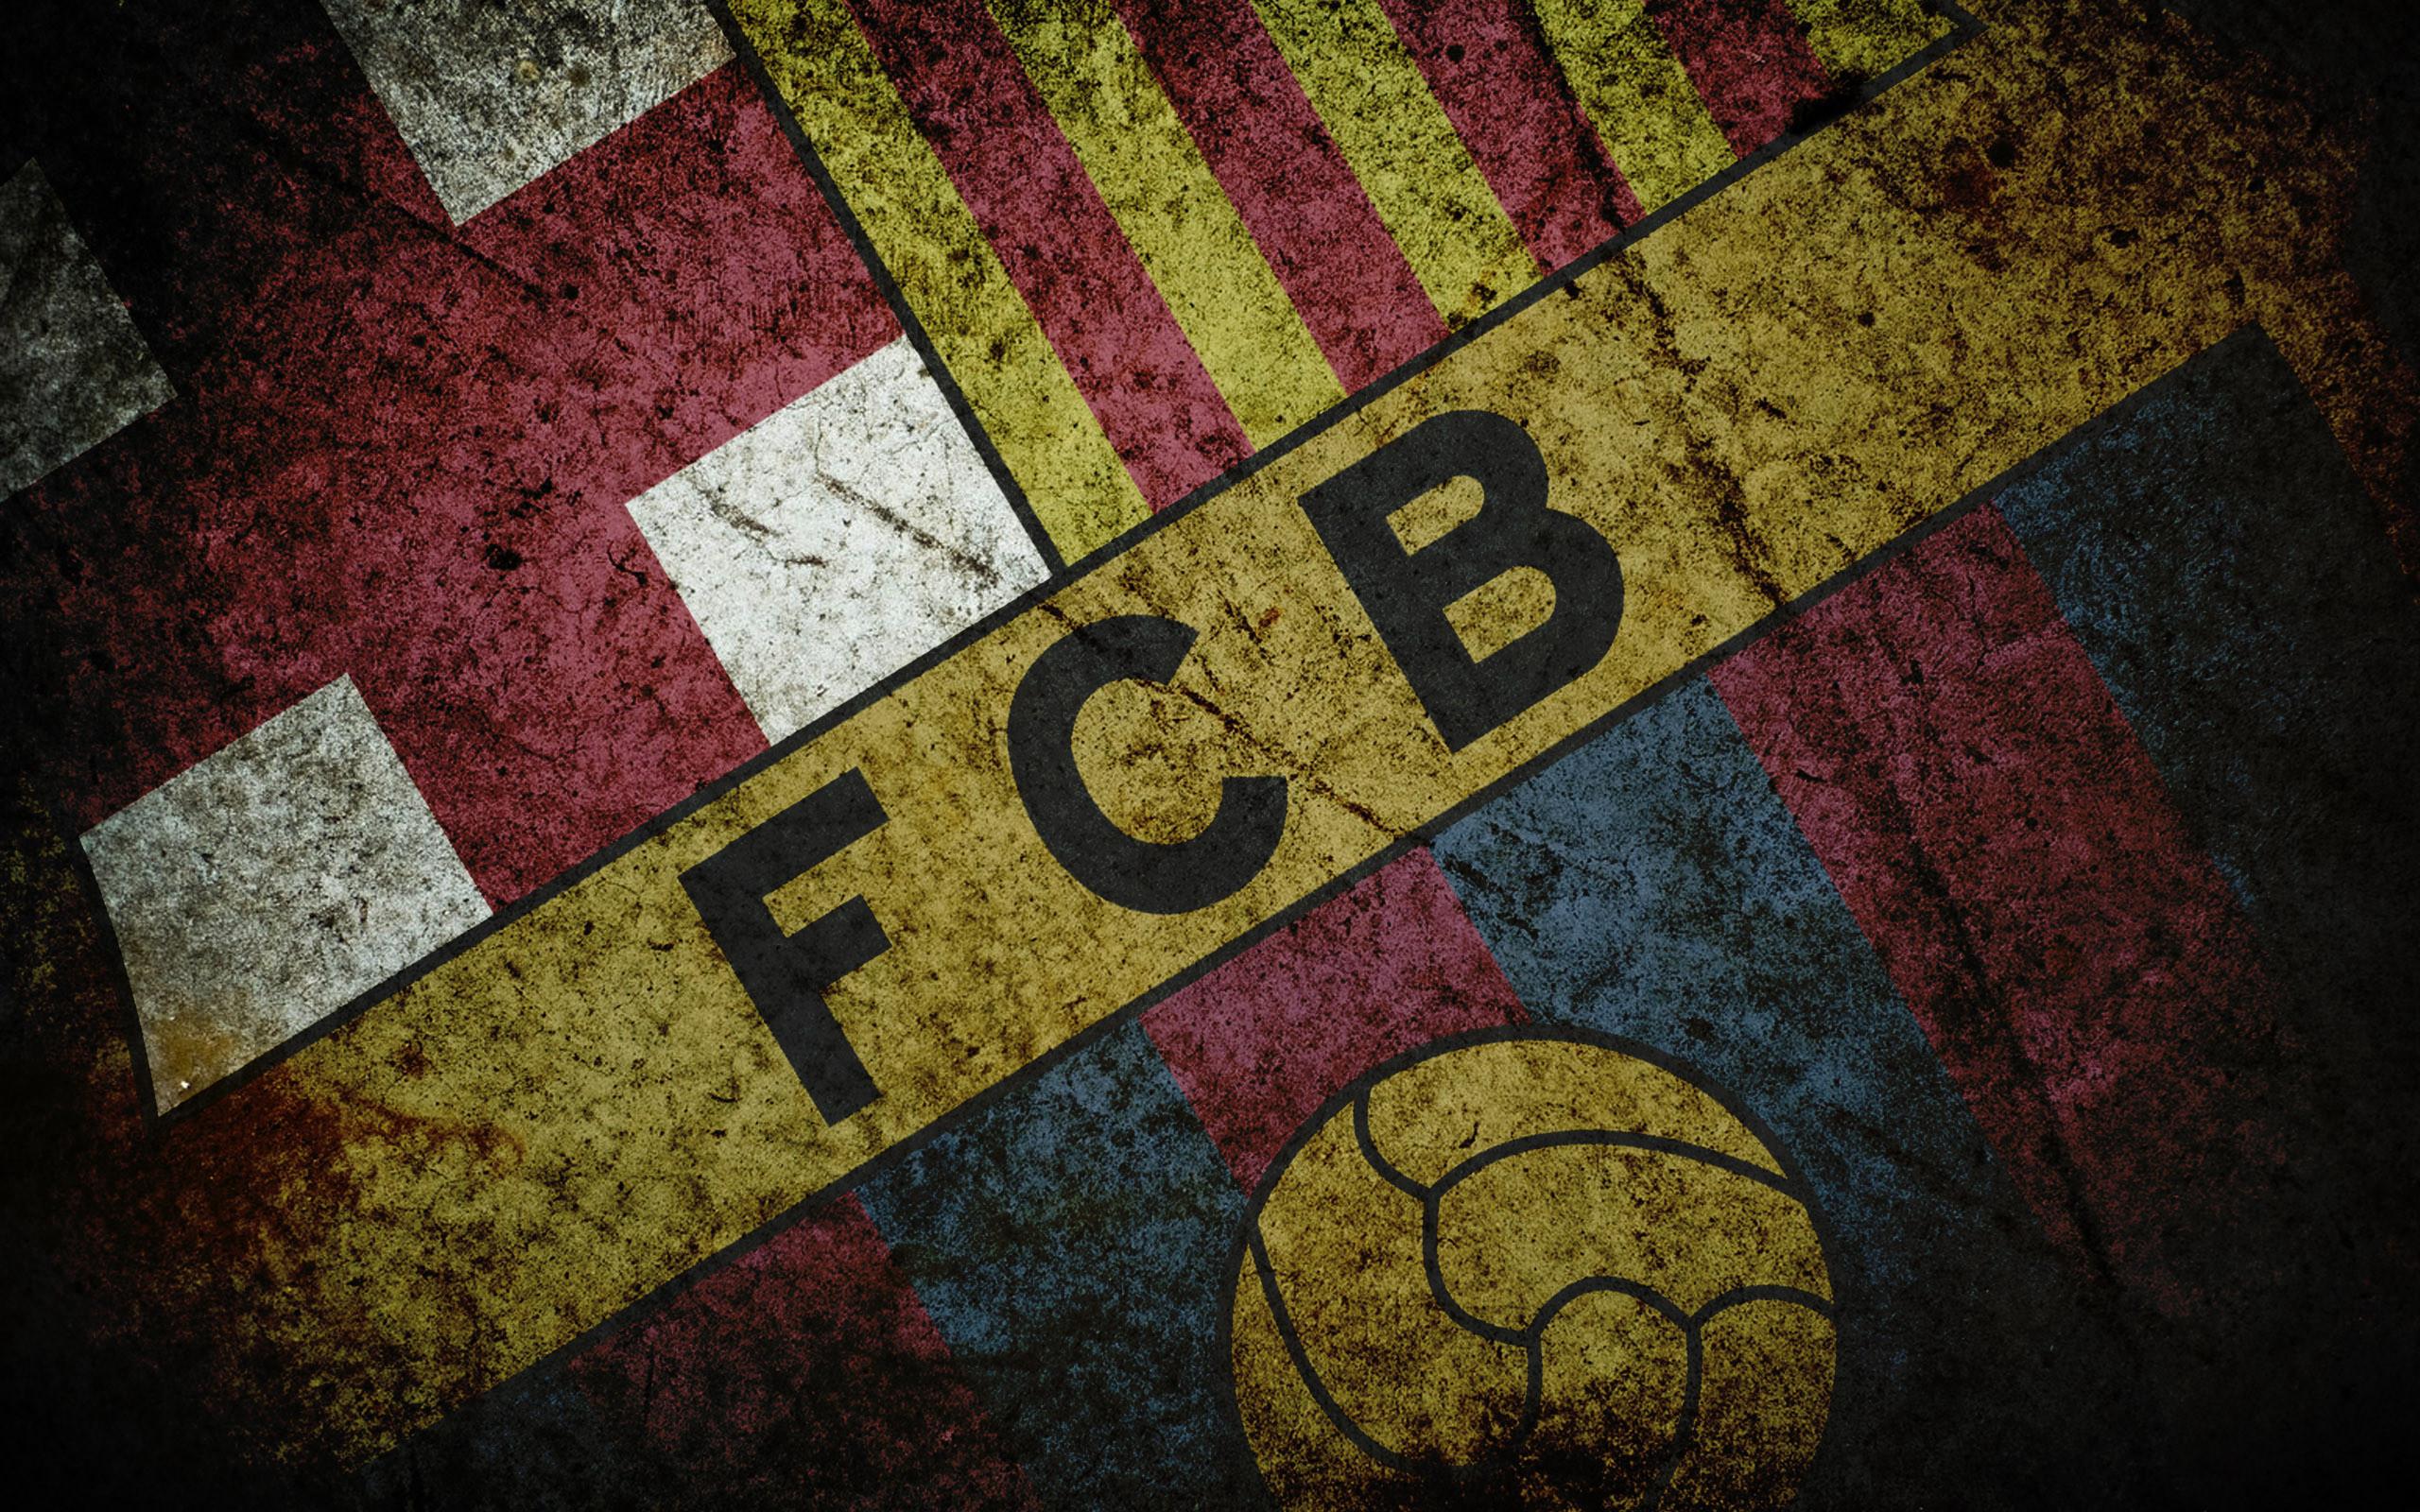 1920x1080 FC Barcelona HD Wallpaper | Barcelona Photos | New Wallpapers